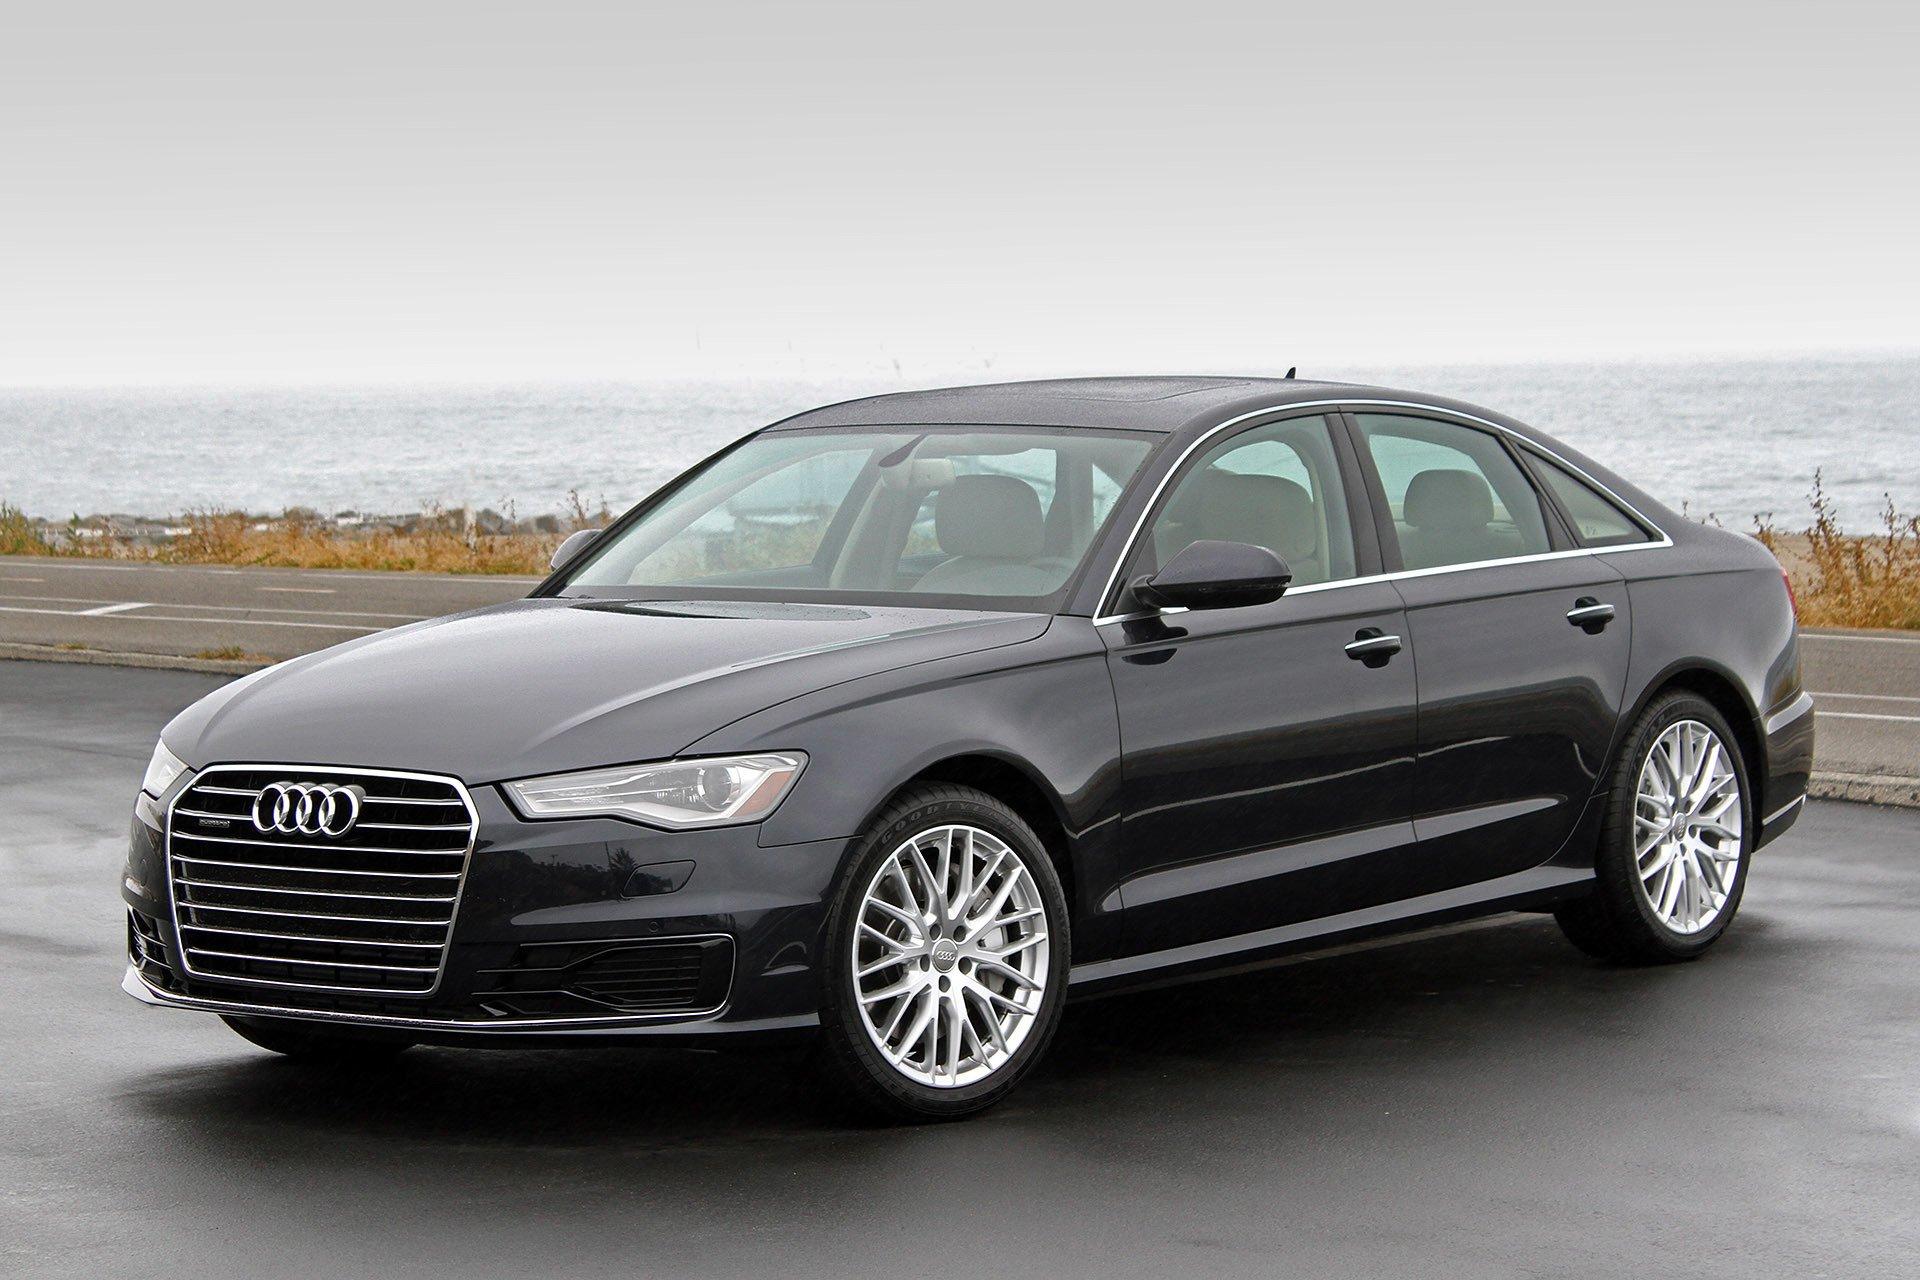 2016 audi a6 cars sedan black wallpaper 1920x1280